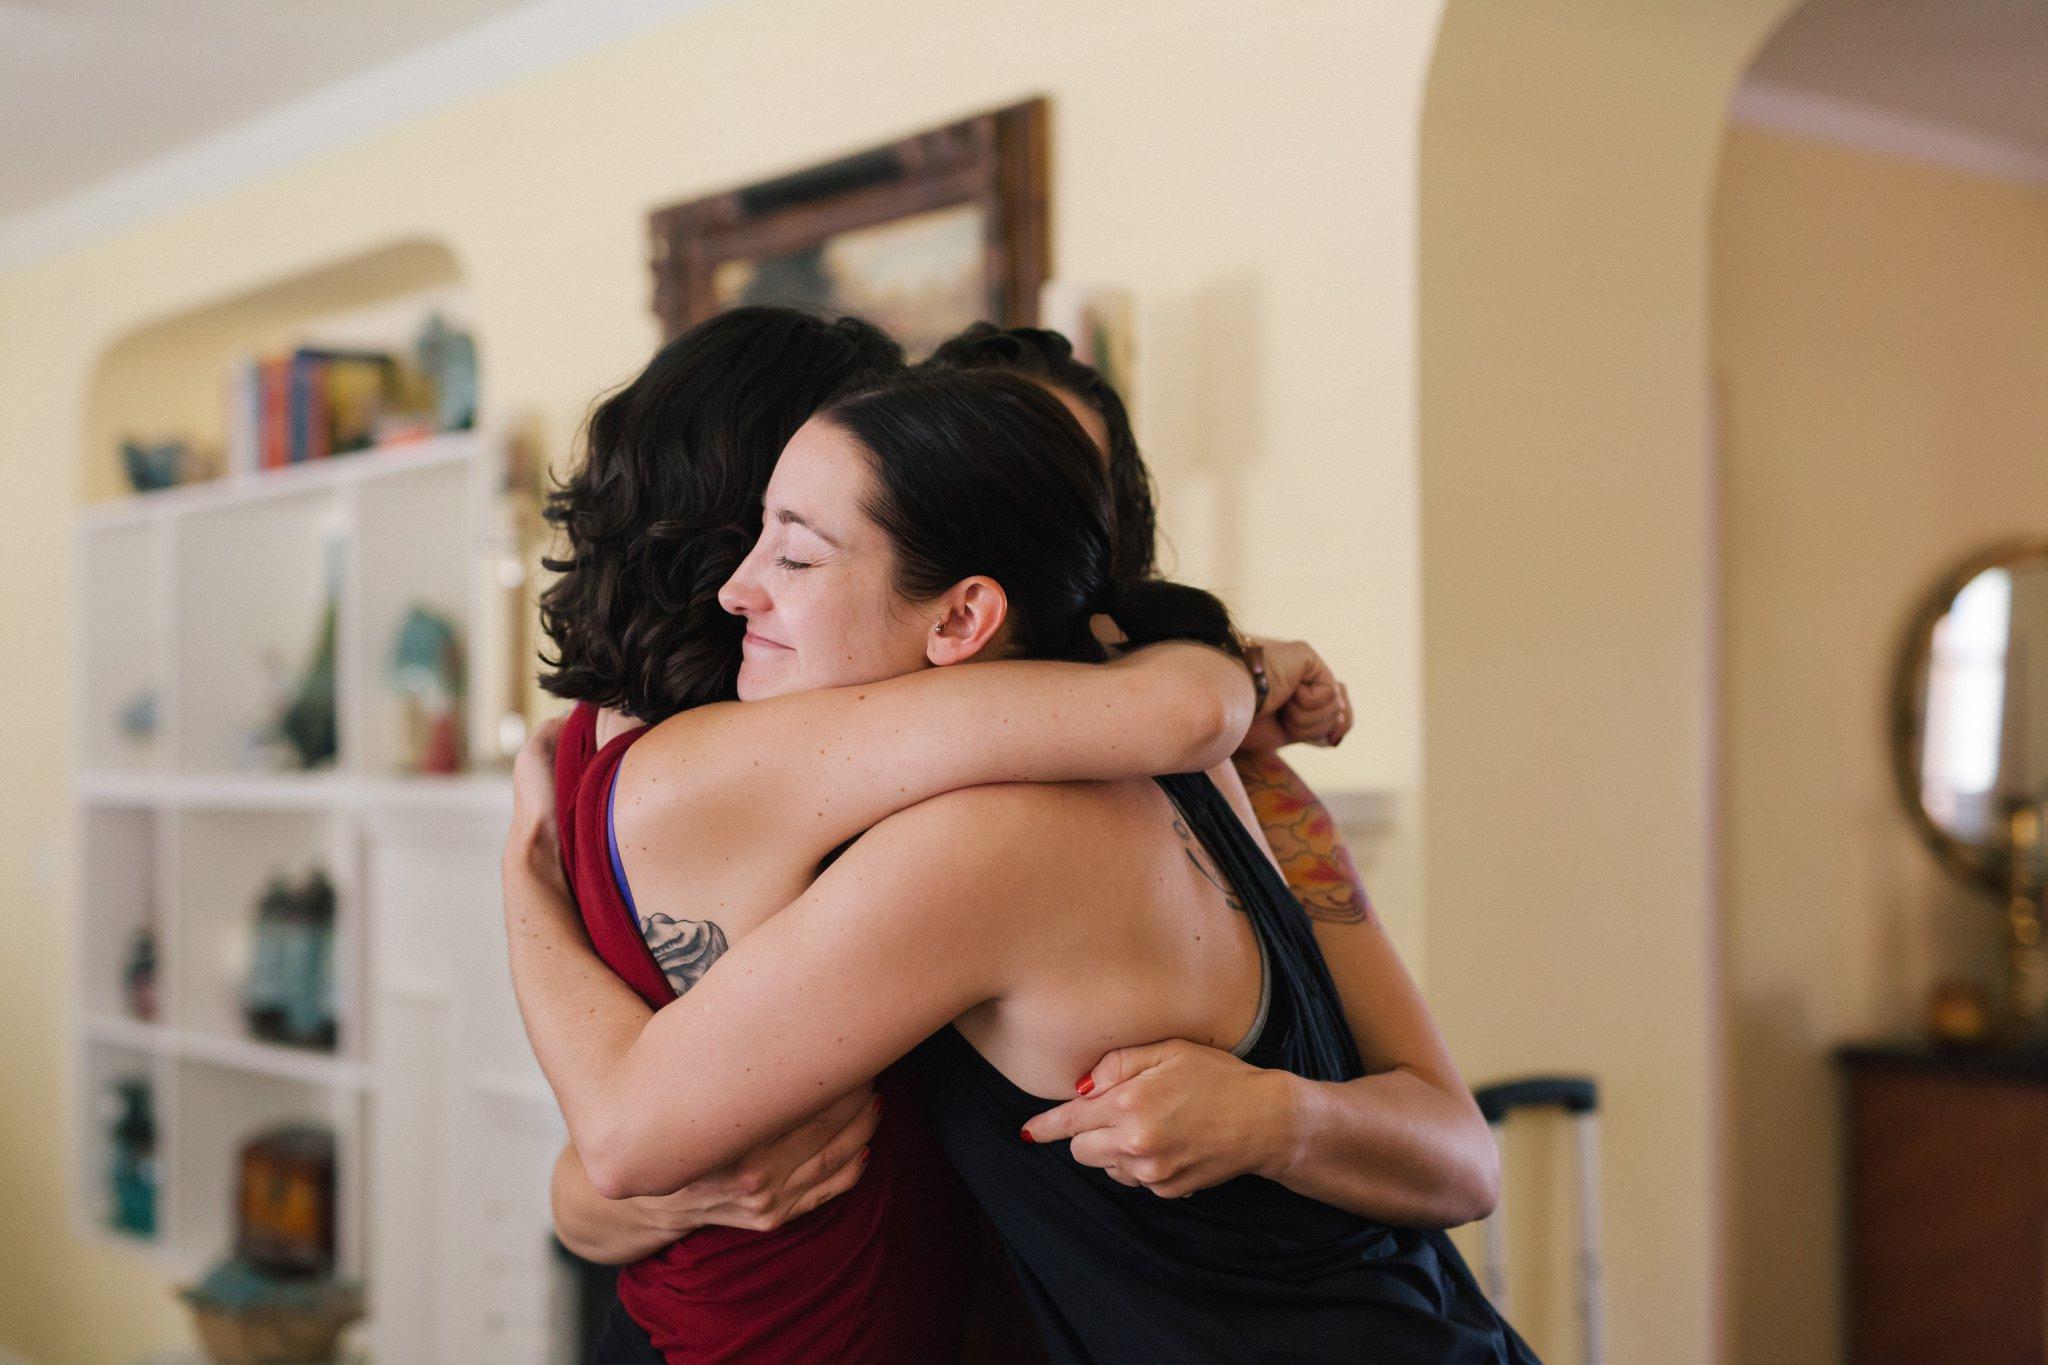 Arizona meaningful wedding photography documentary candid moment